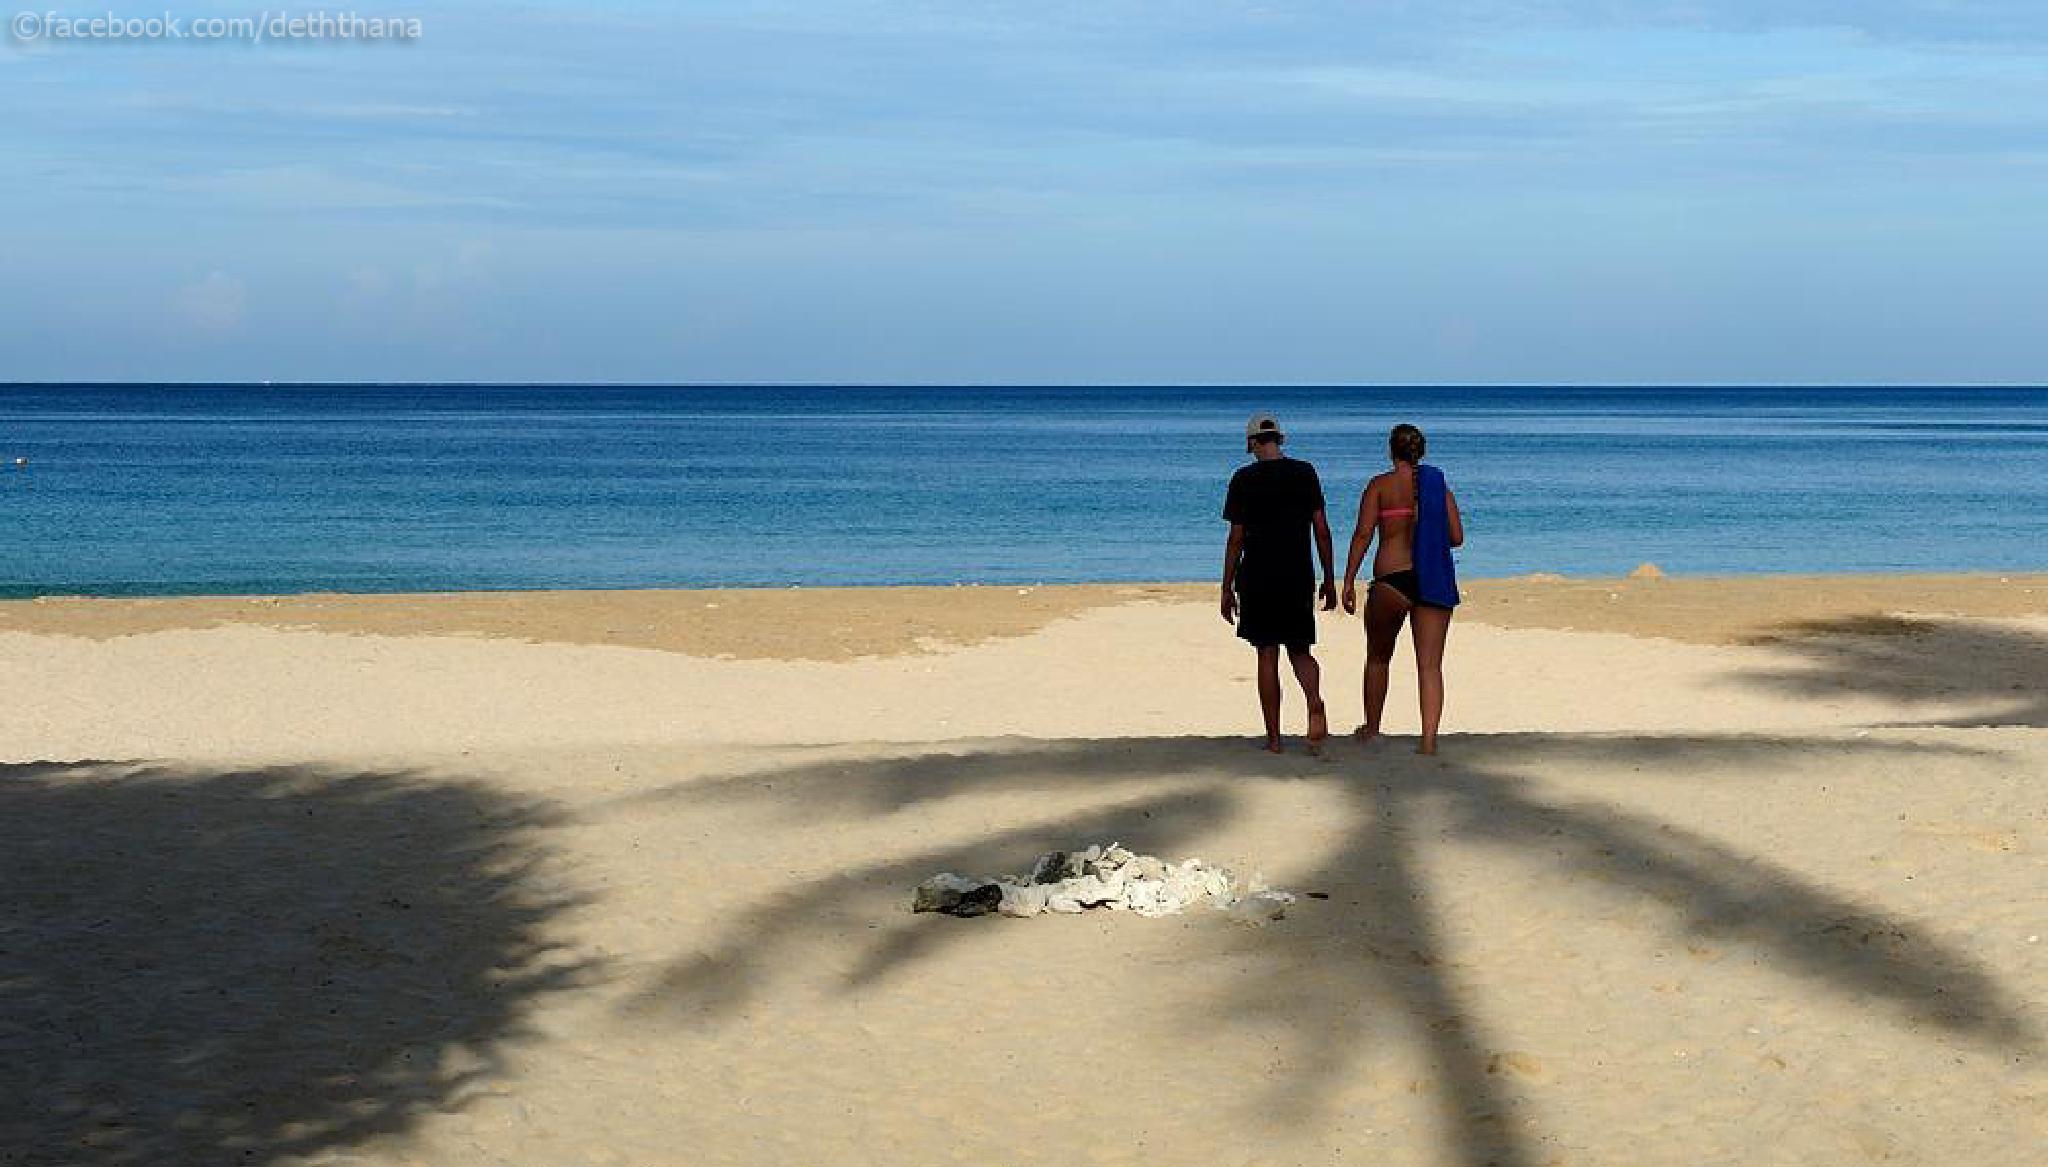 Together on the beach by Deththana Athithanaphokin